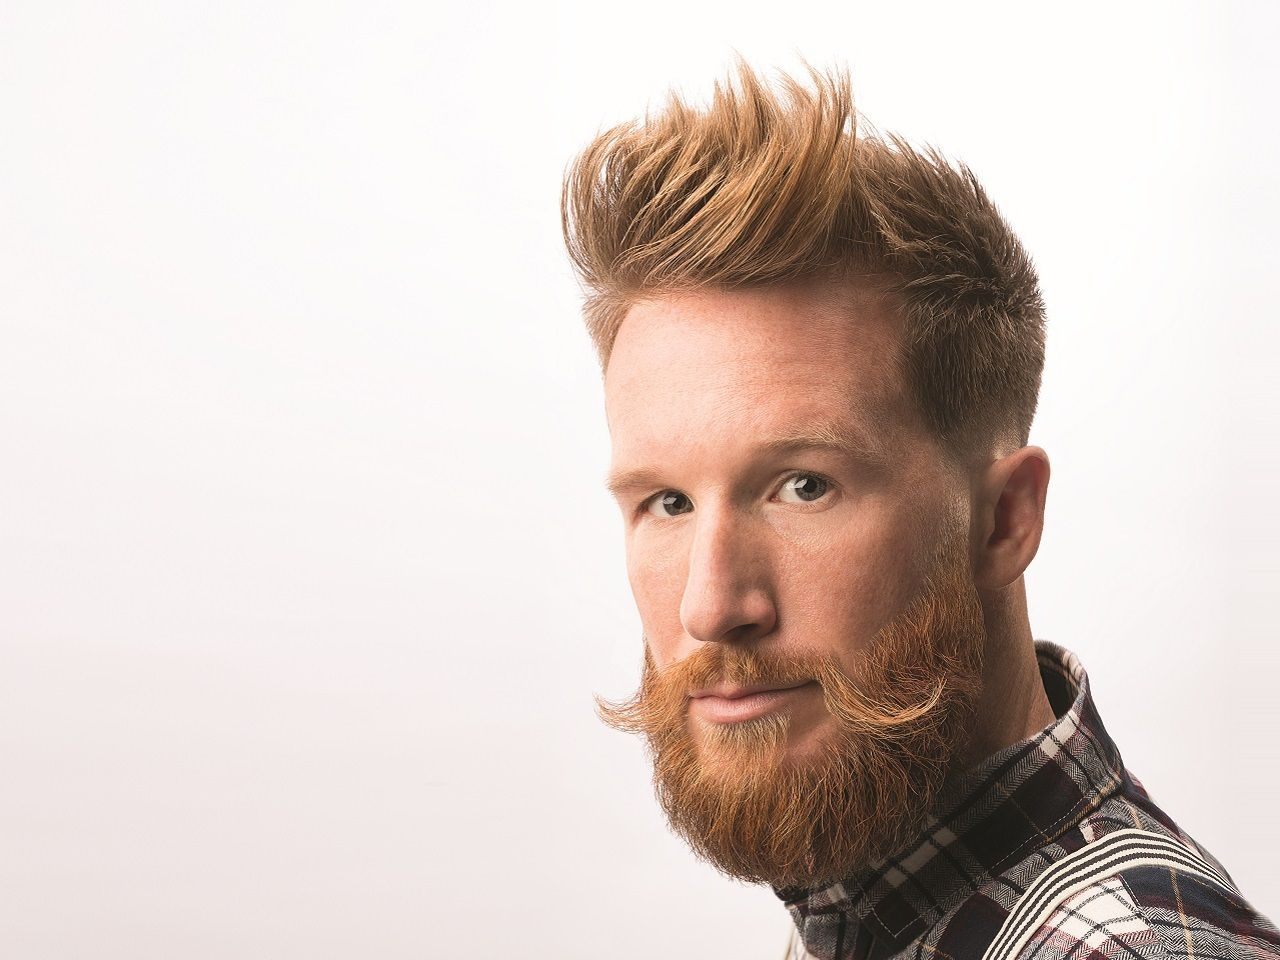 Pivot Point Herenkapsel Uit Fundamentals Barbierstechnieken Heren Herenkapsel Mannenkapsels